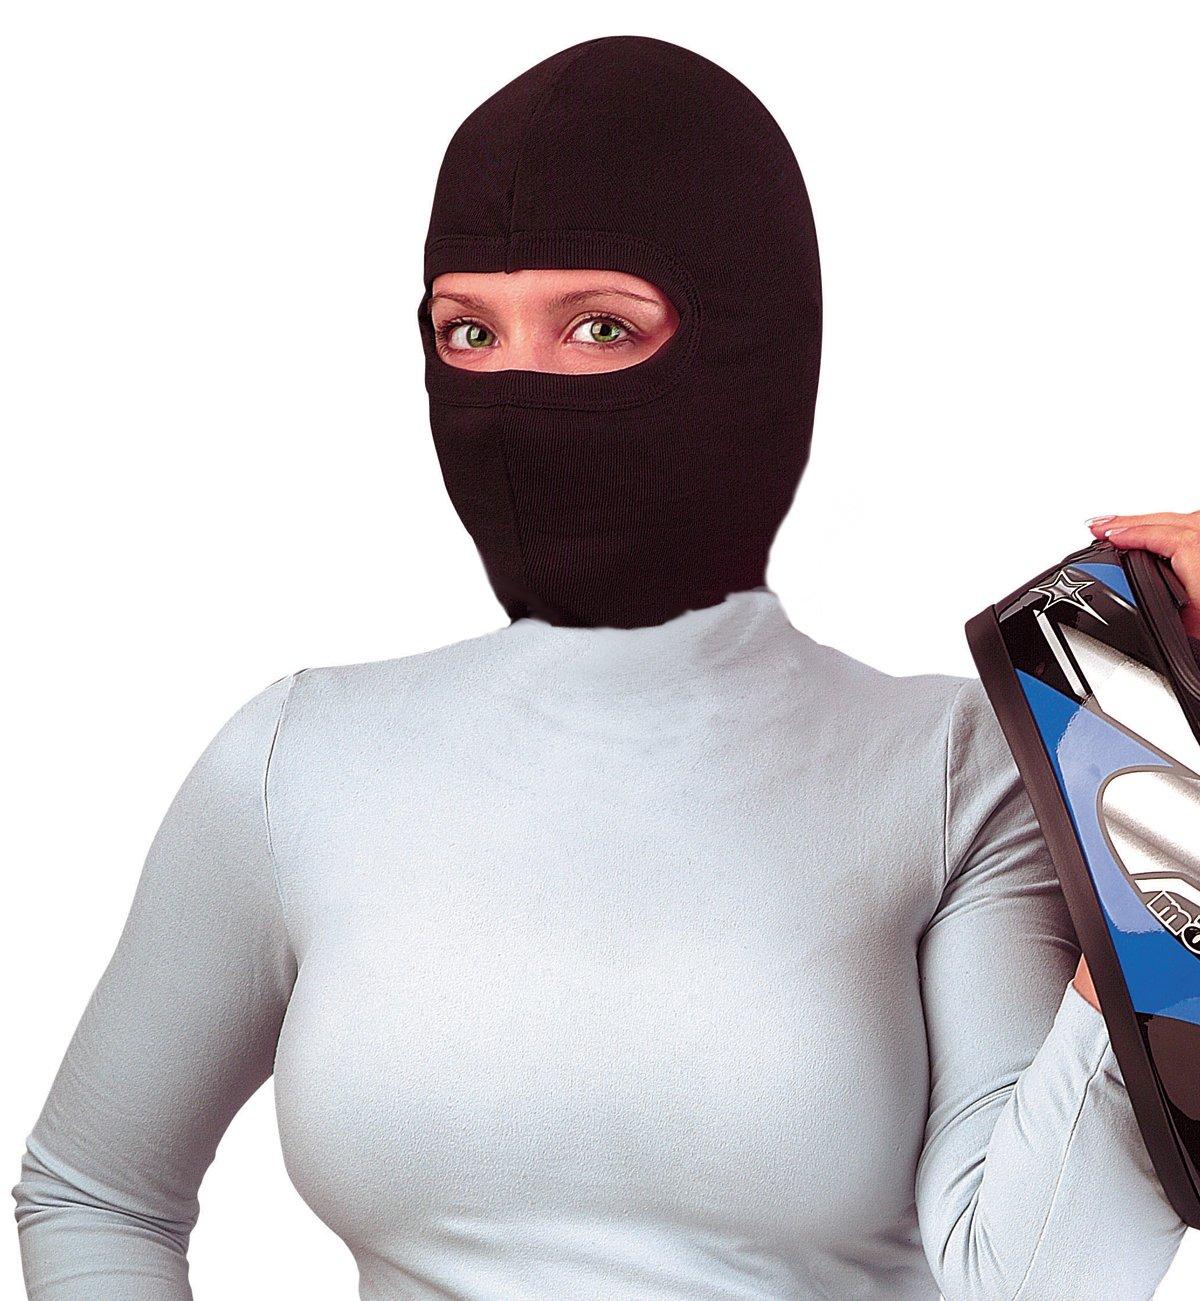 Raider, 1810B-XT, Balaclava Full Face Mask Black PREMIUM - Poly/Cotton Blend - Pack of 50